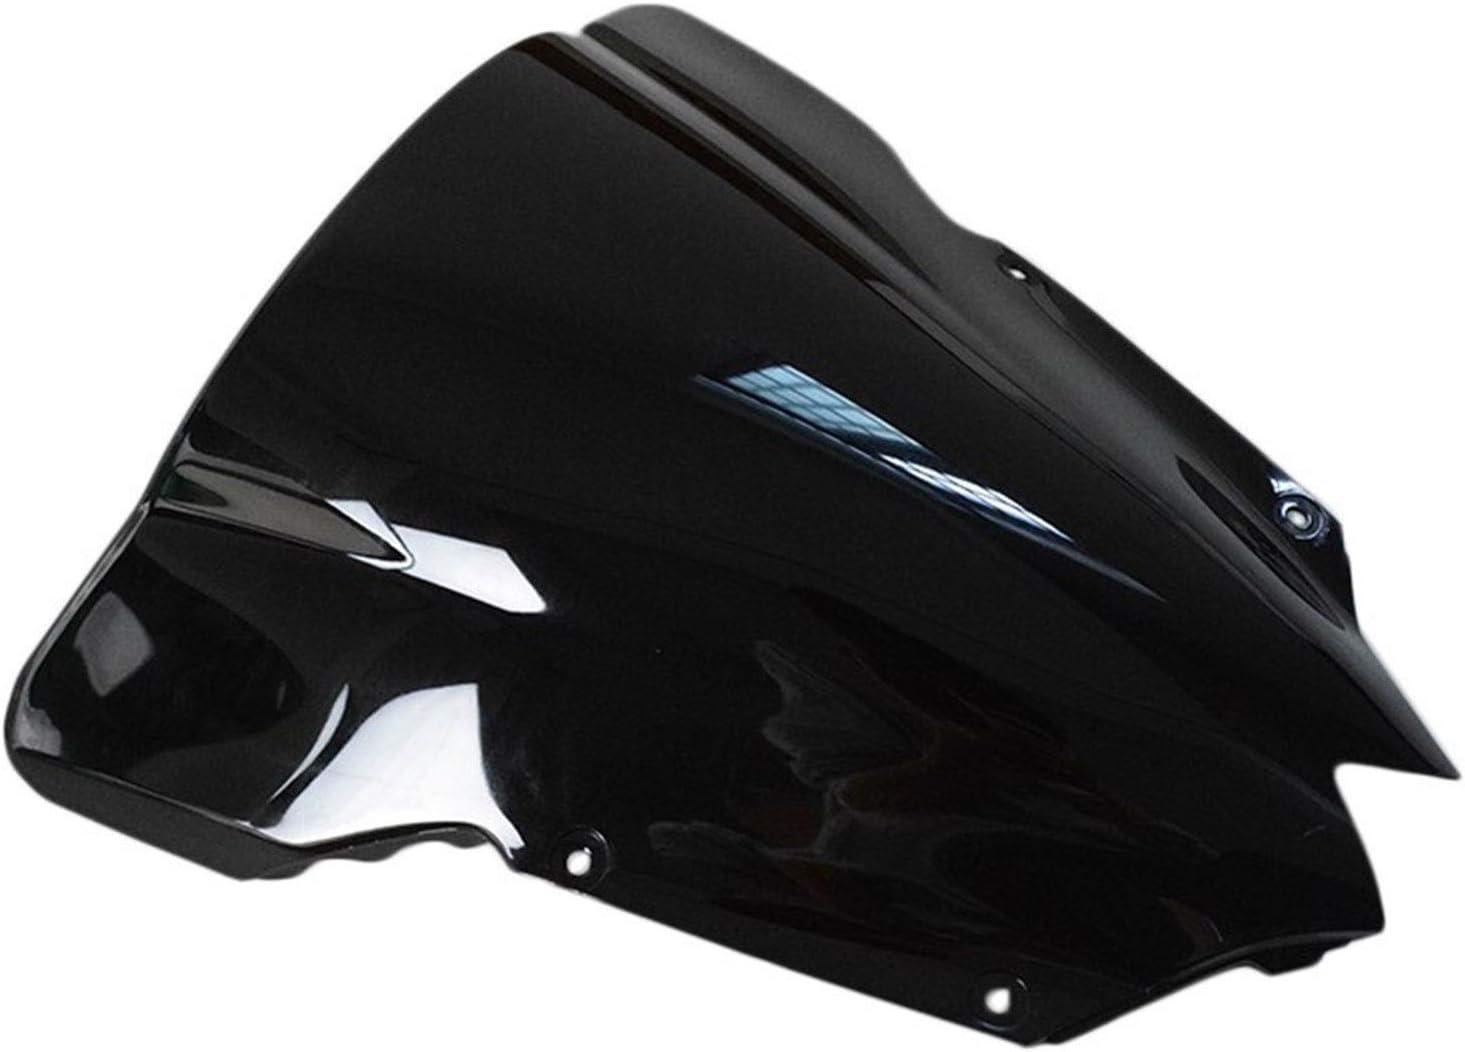 RKRLJX Ultra-Cheap Deals Max 88% OFF Motorcycle Black ABS WindScreen Double Windshield Bubble